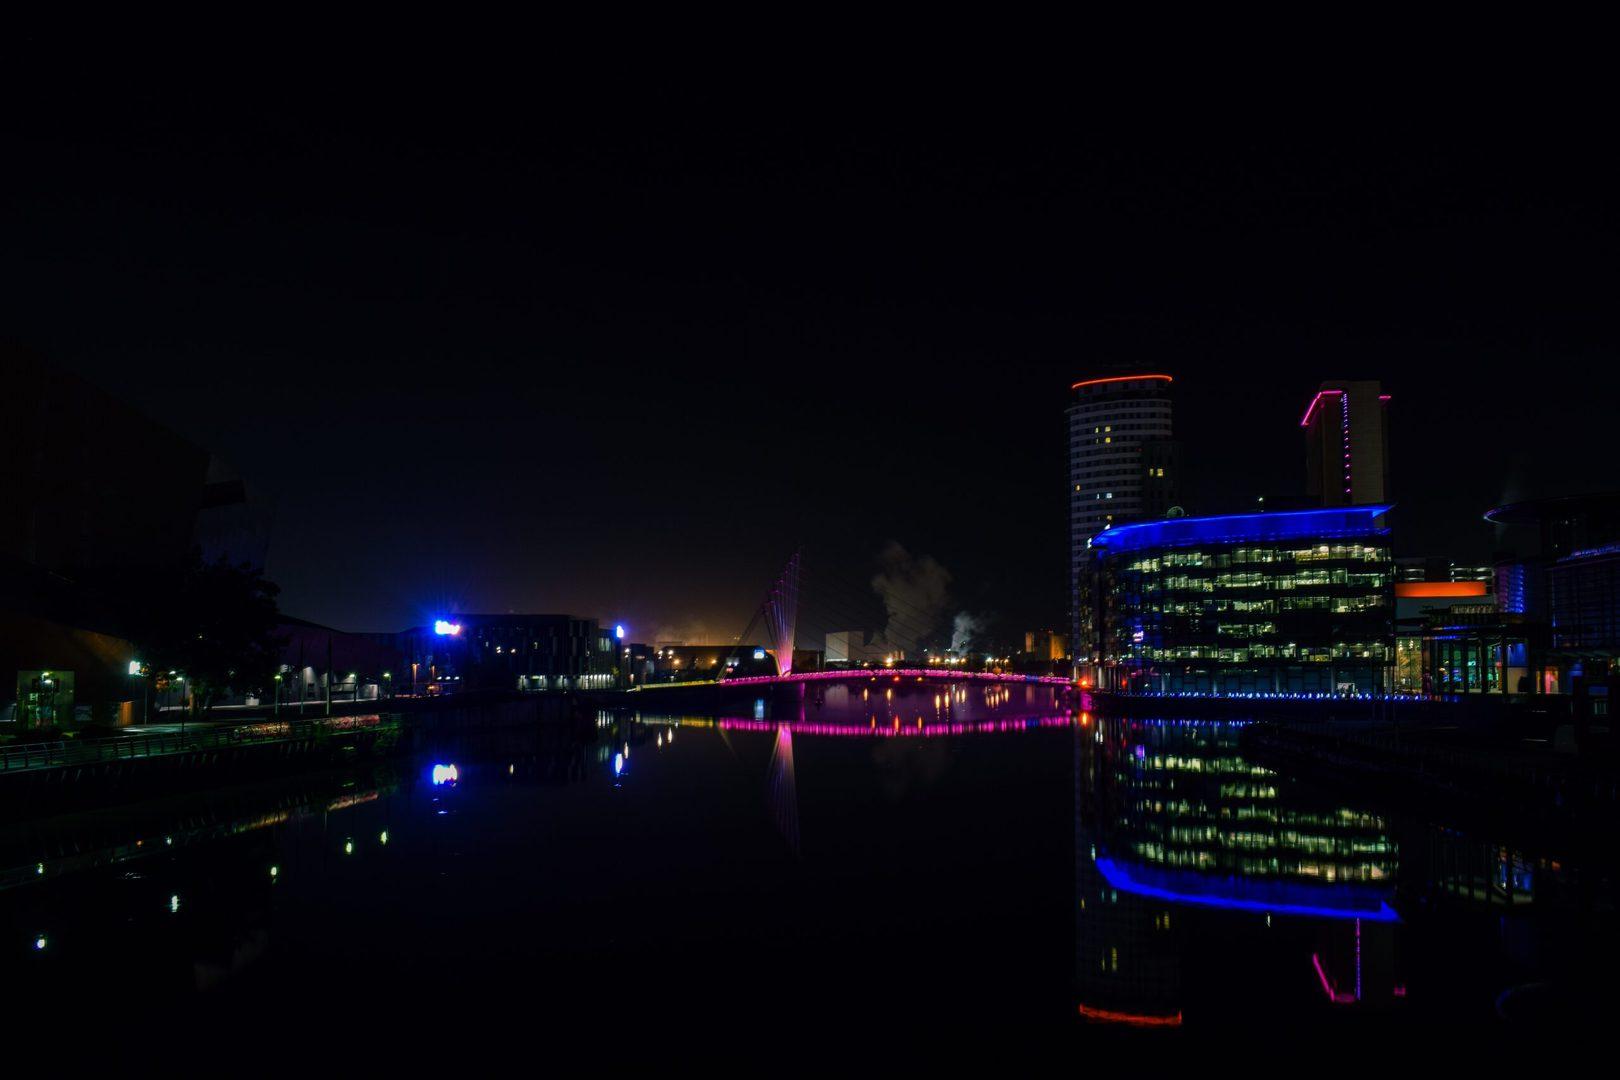 BBC Manchester_bro_bynight_studierejser_alfatravel